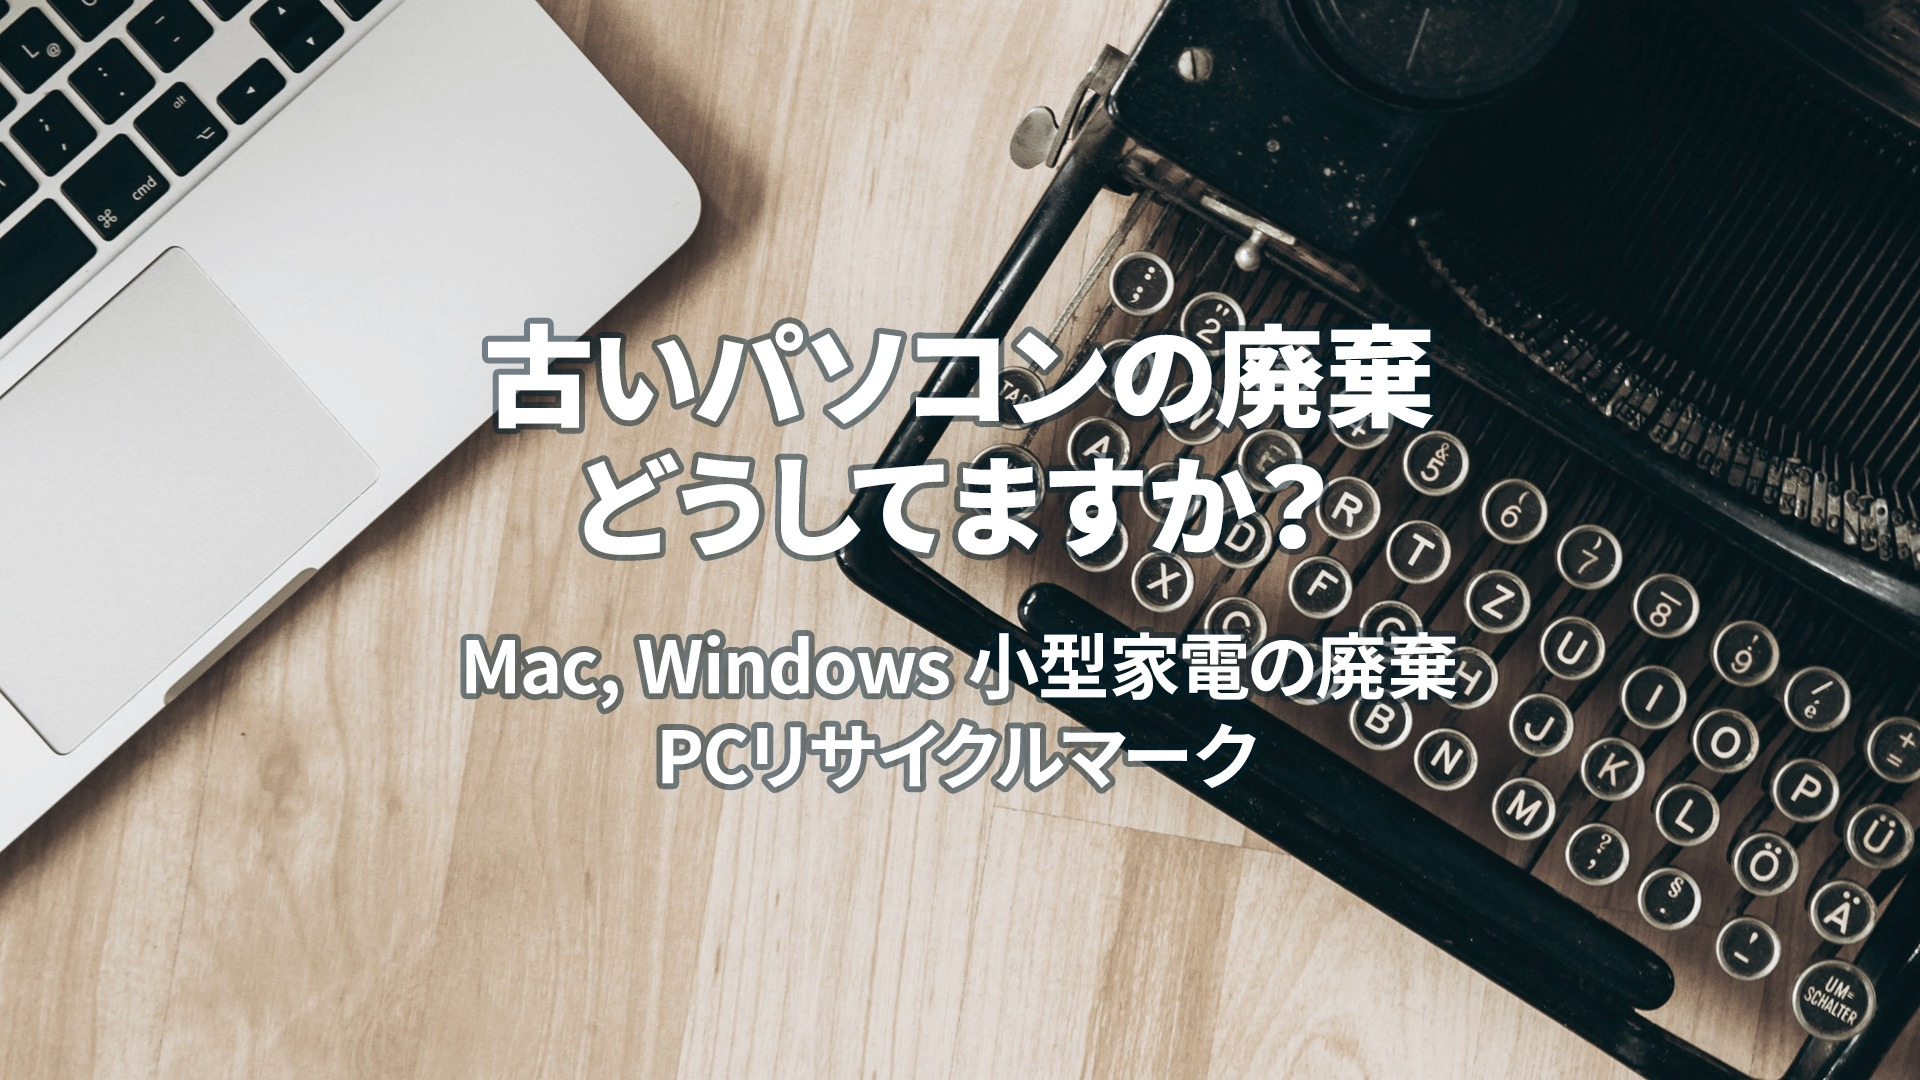 Mac, Windows 小型家電の廃棄、PCリサイクルマーク